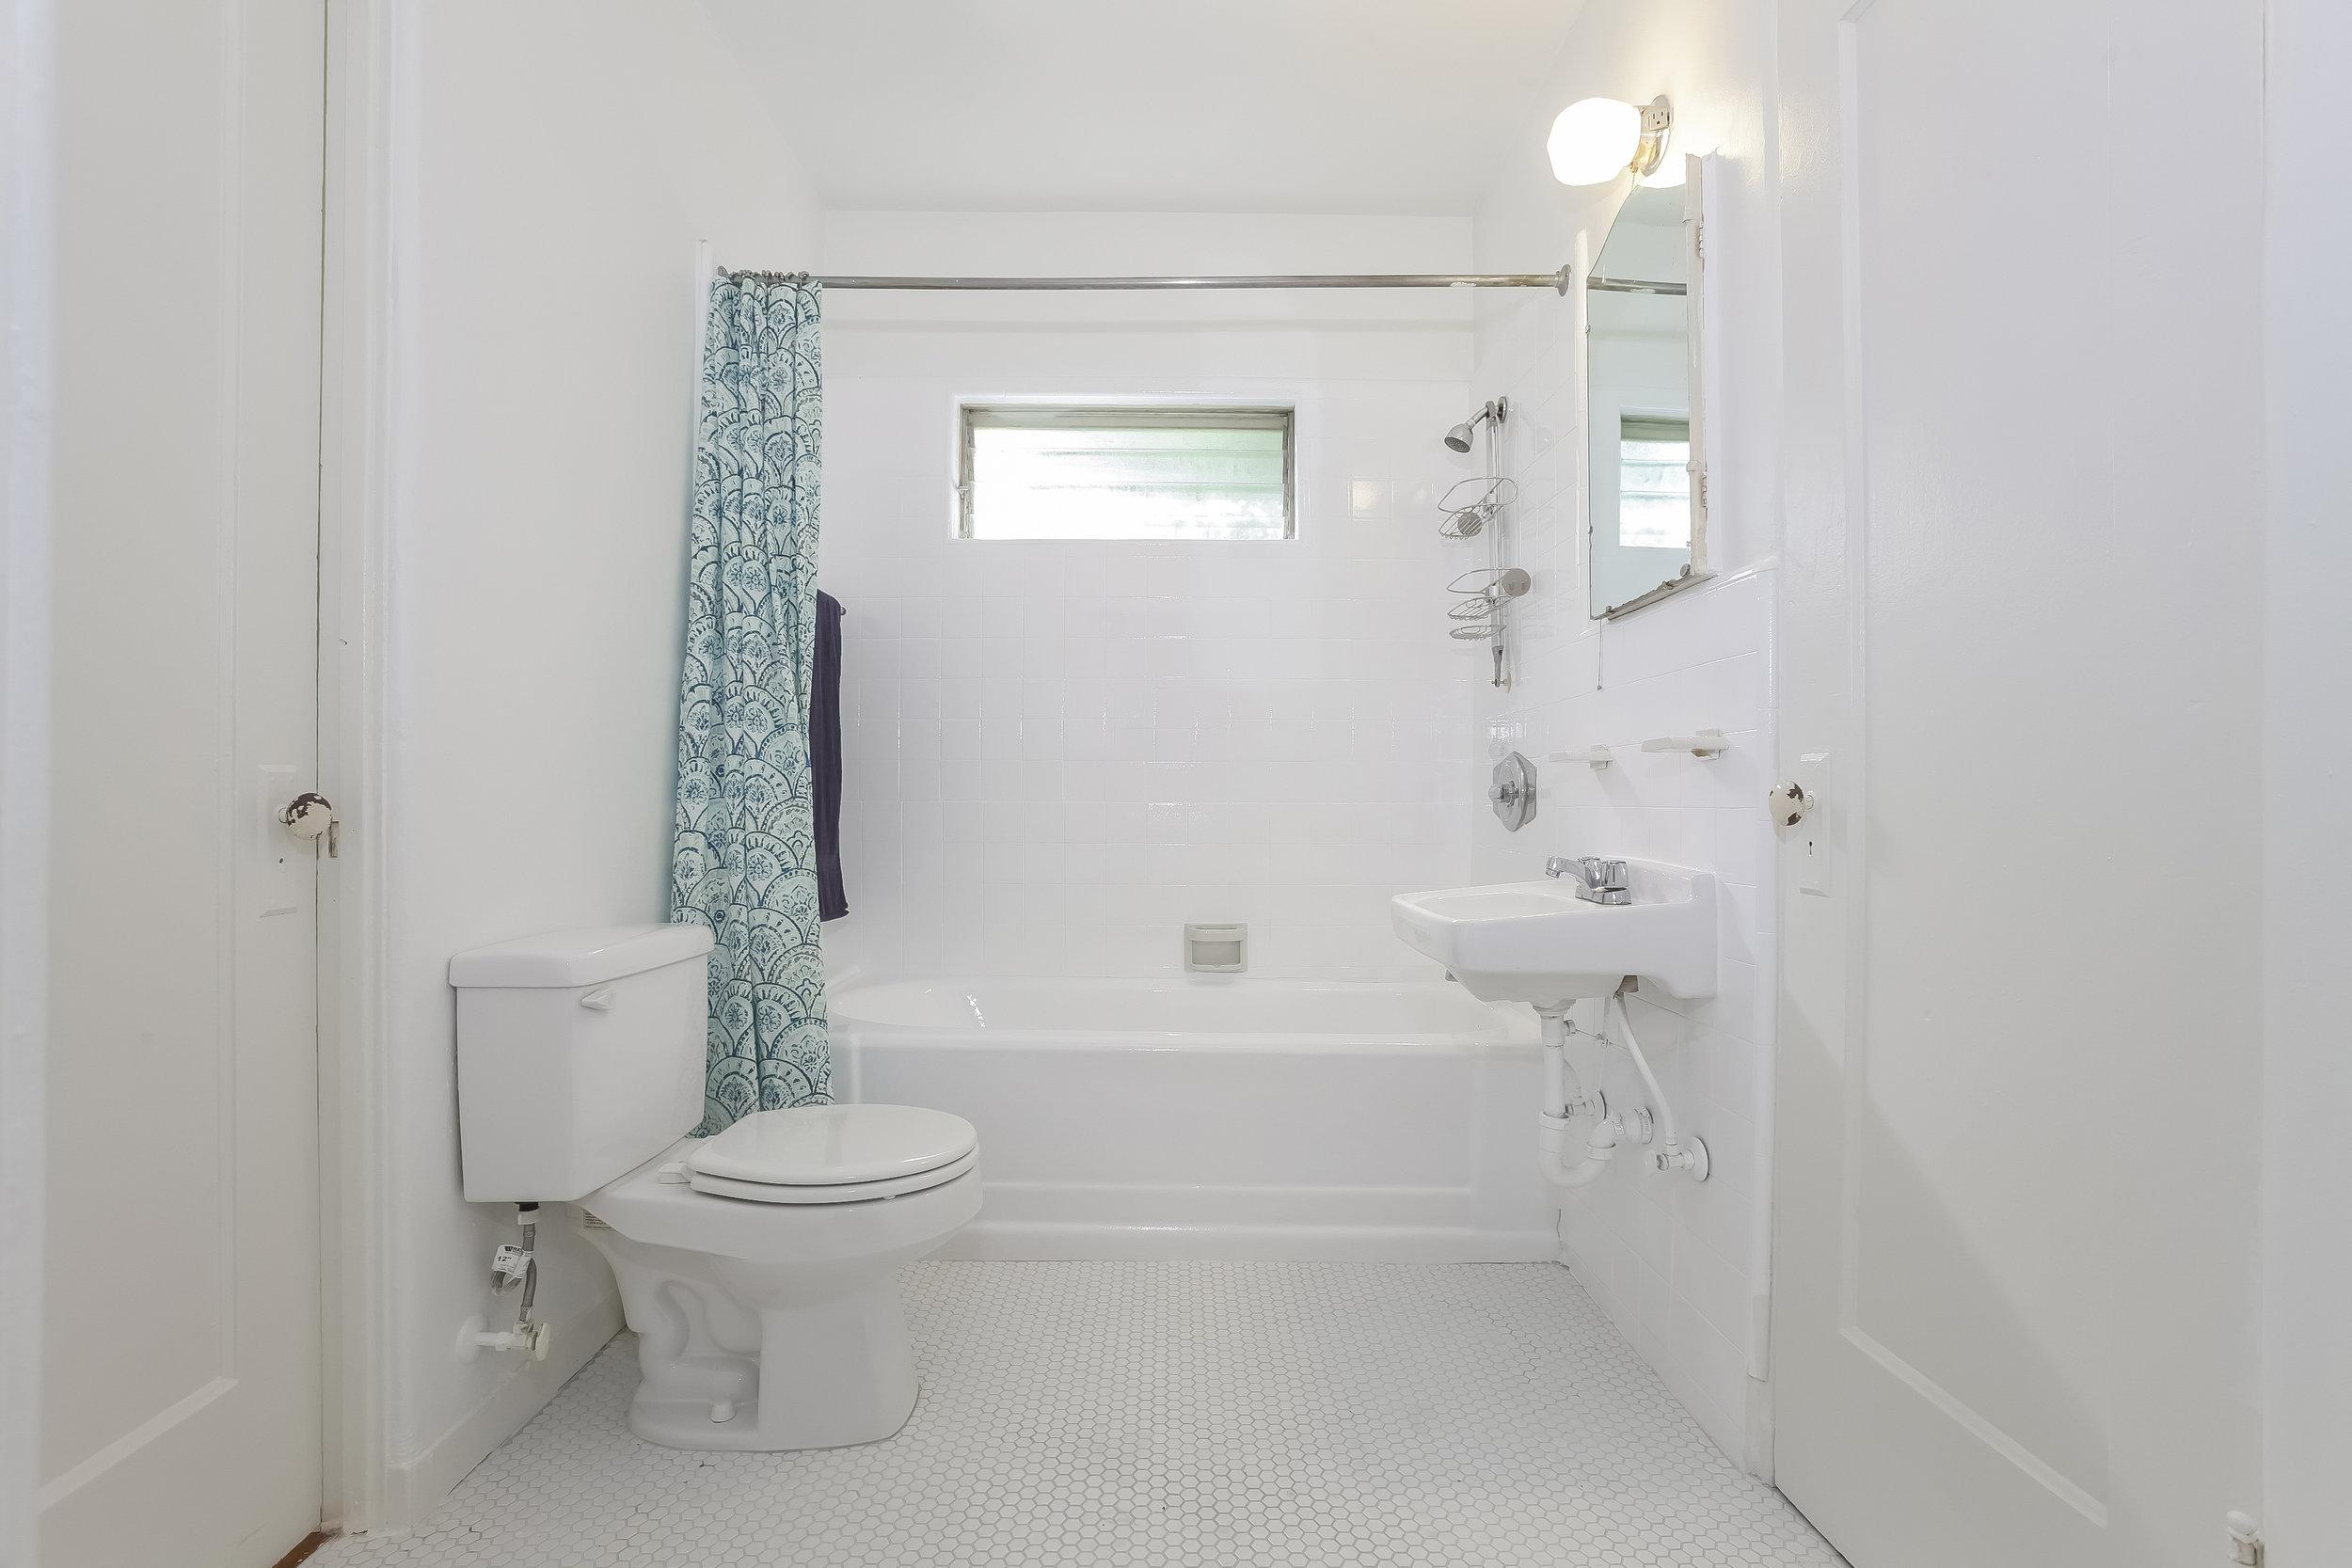 016-Bathroom-4517249-large.jpg